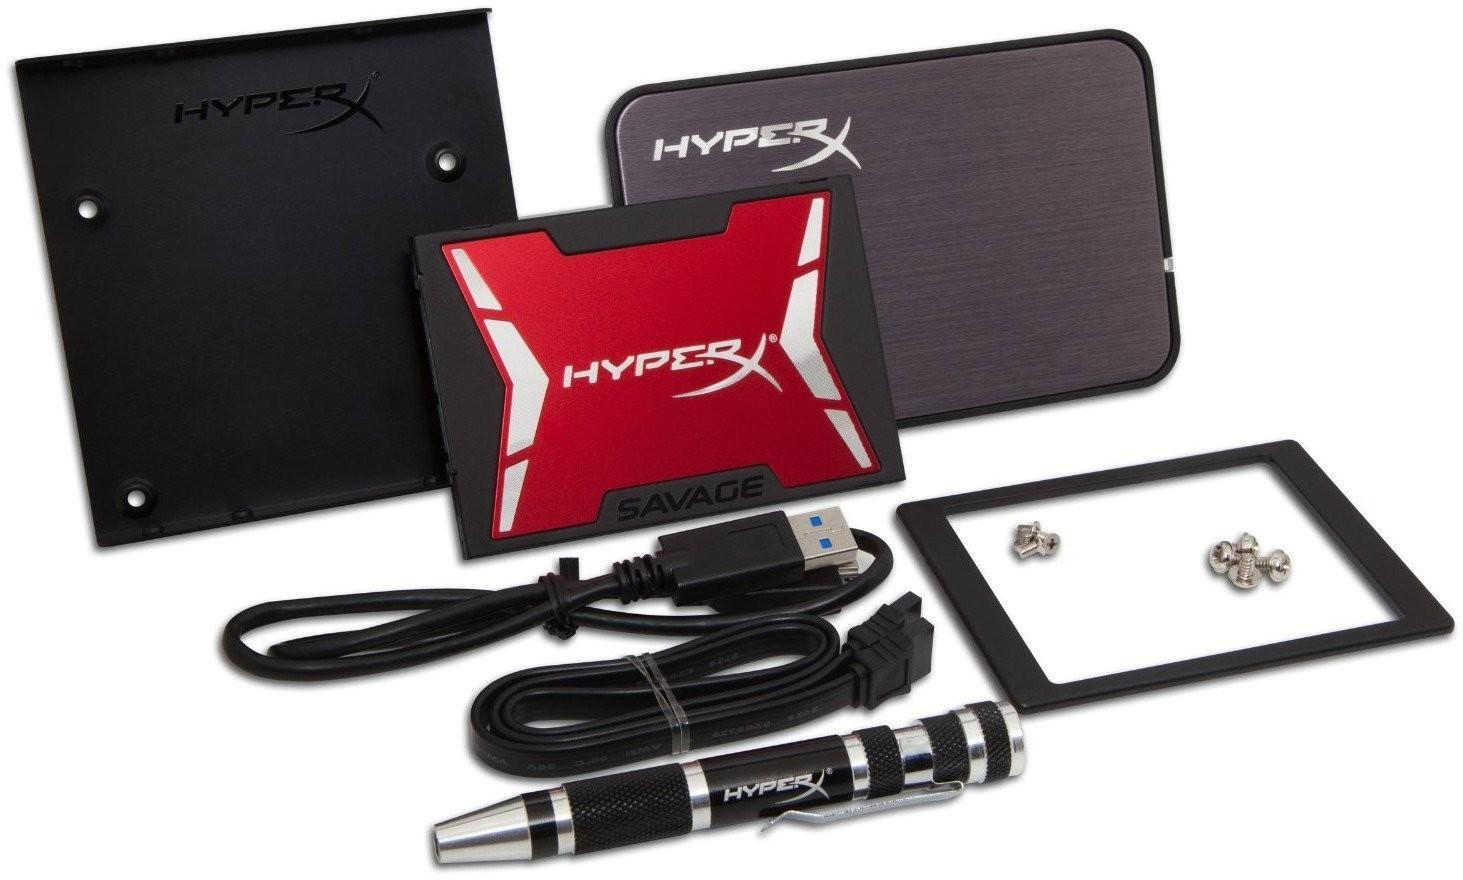 Kingston HyperX Savage 960GB SHSS3B7A/960G